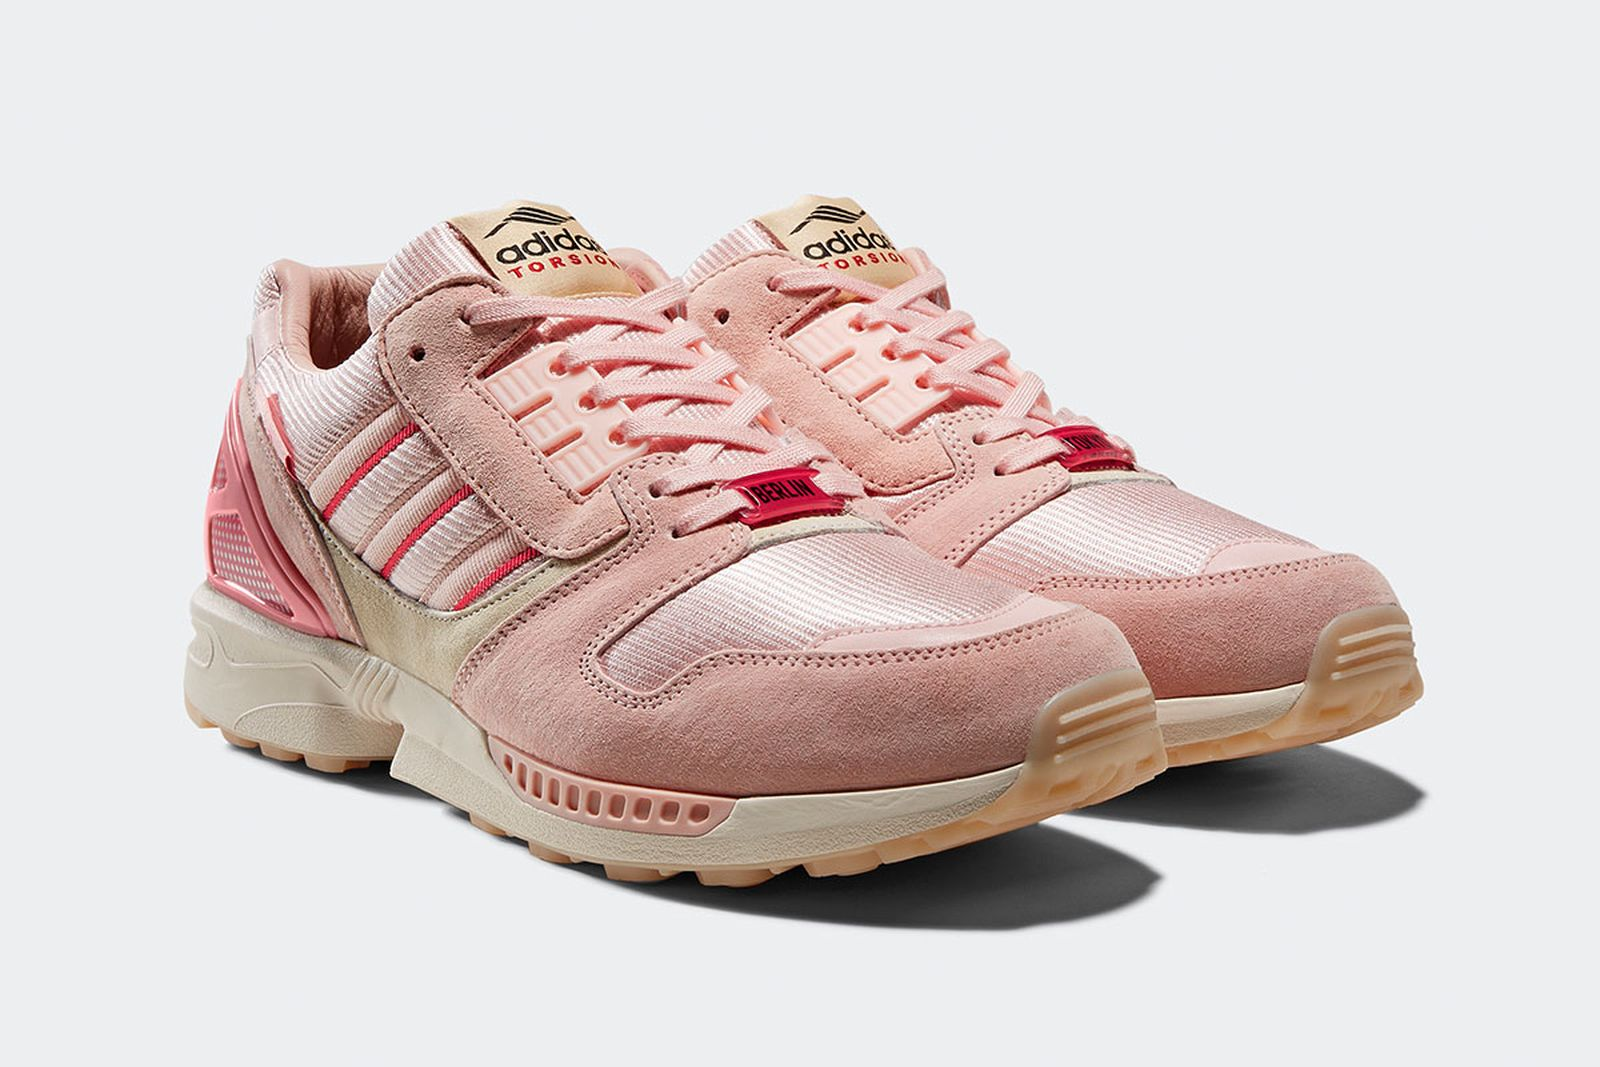 adidas-originals-zx-8000-kirschblutenallee-release-date-price-04